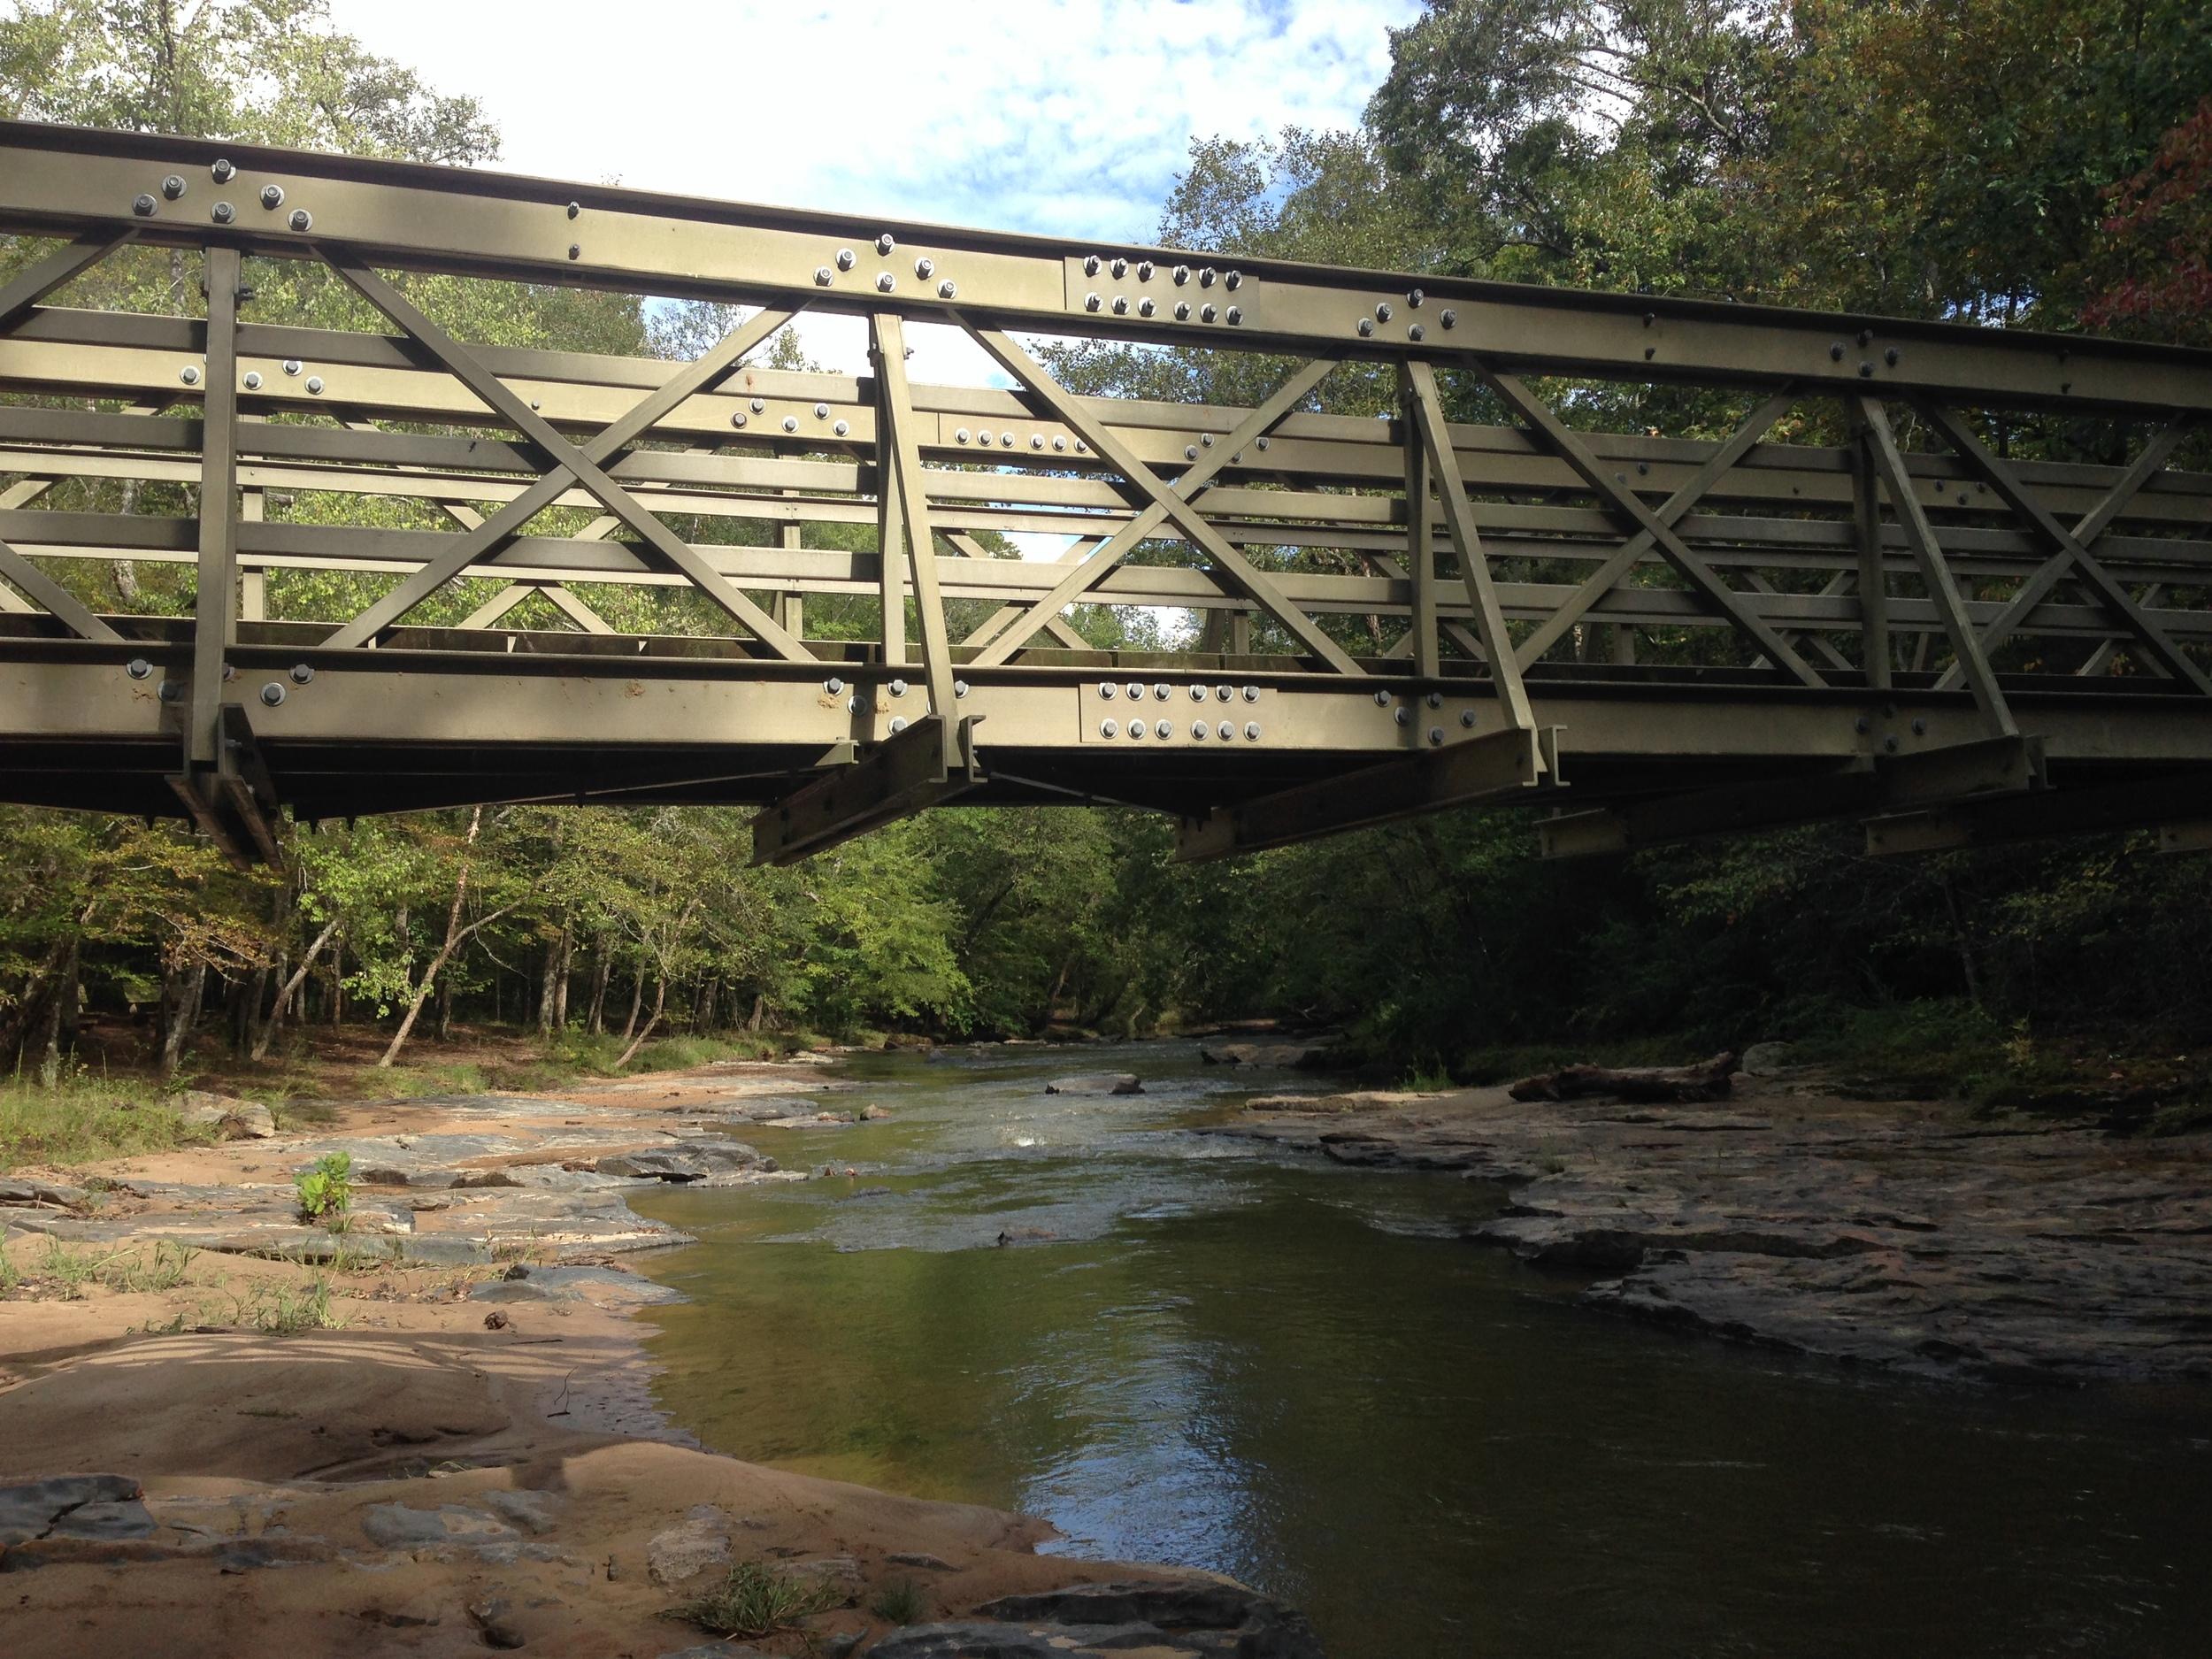 Bridge over Fairforest Creek.